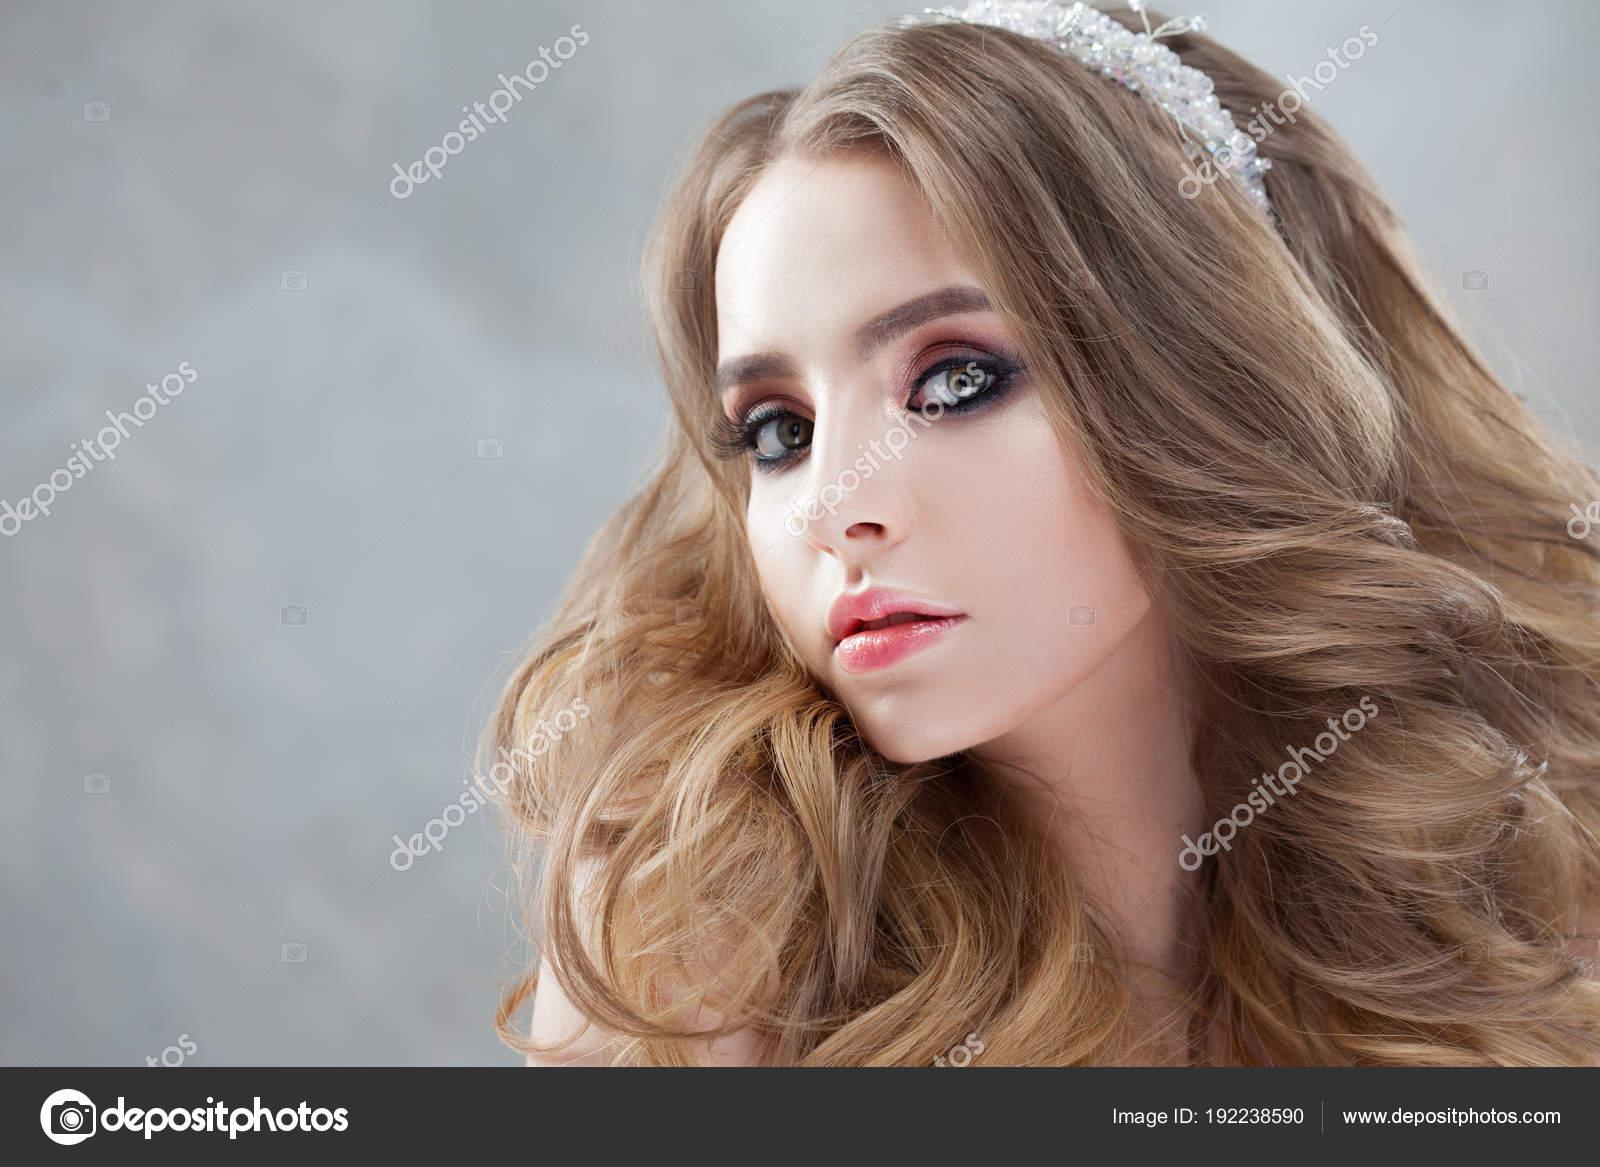 a895165e7c Νέοι όμορφη νύφη με πολυτελές μπούκλες. Χτένισμα του γάμου με τιάρα —  Φωτογραφία Αρχείου